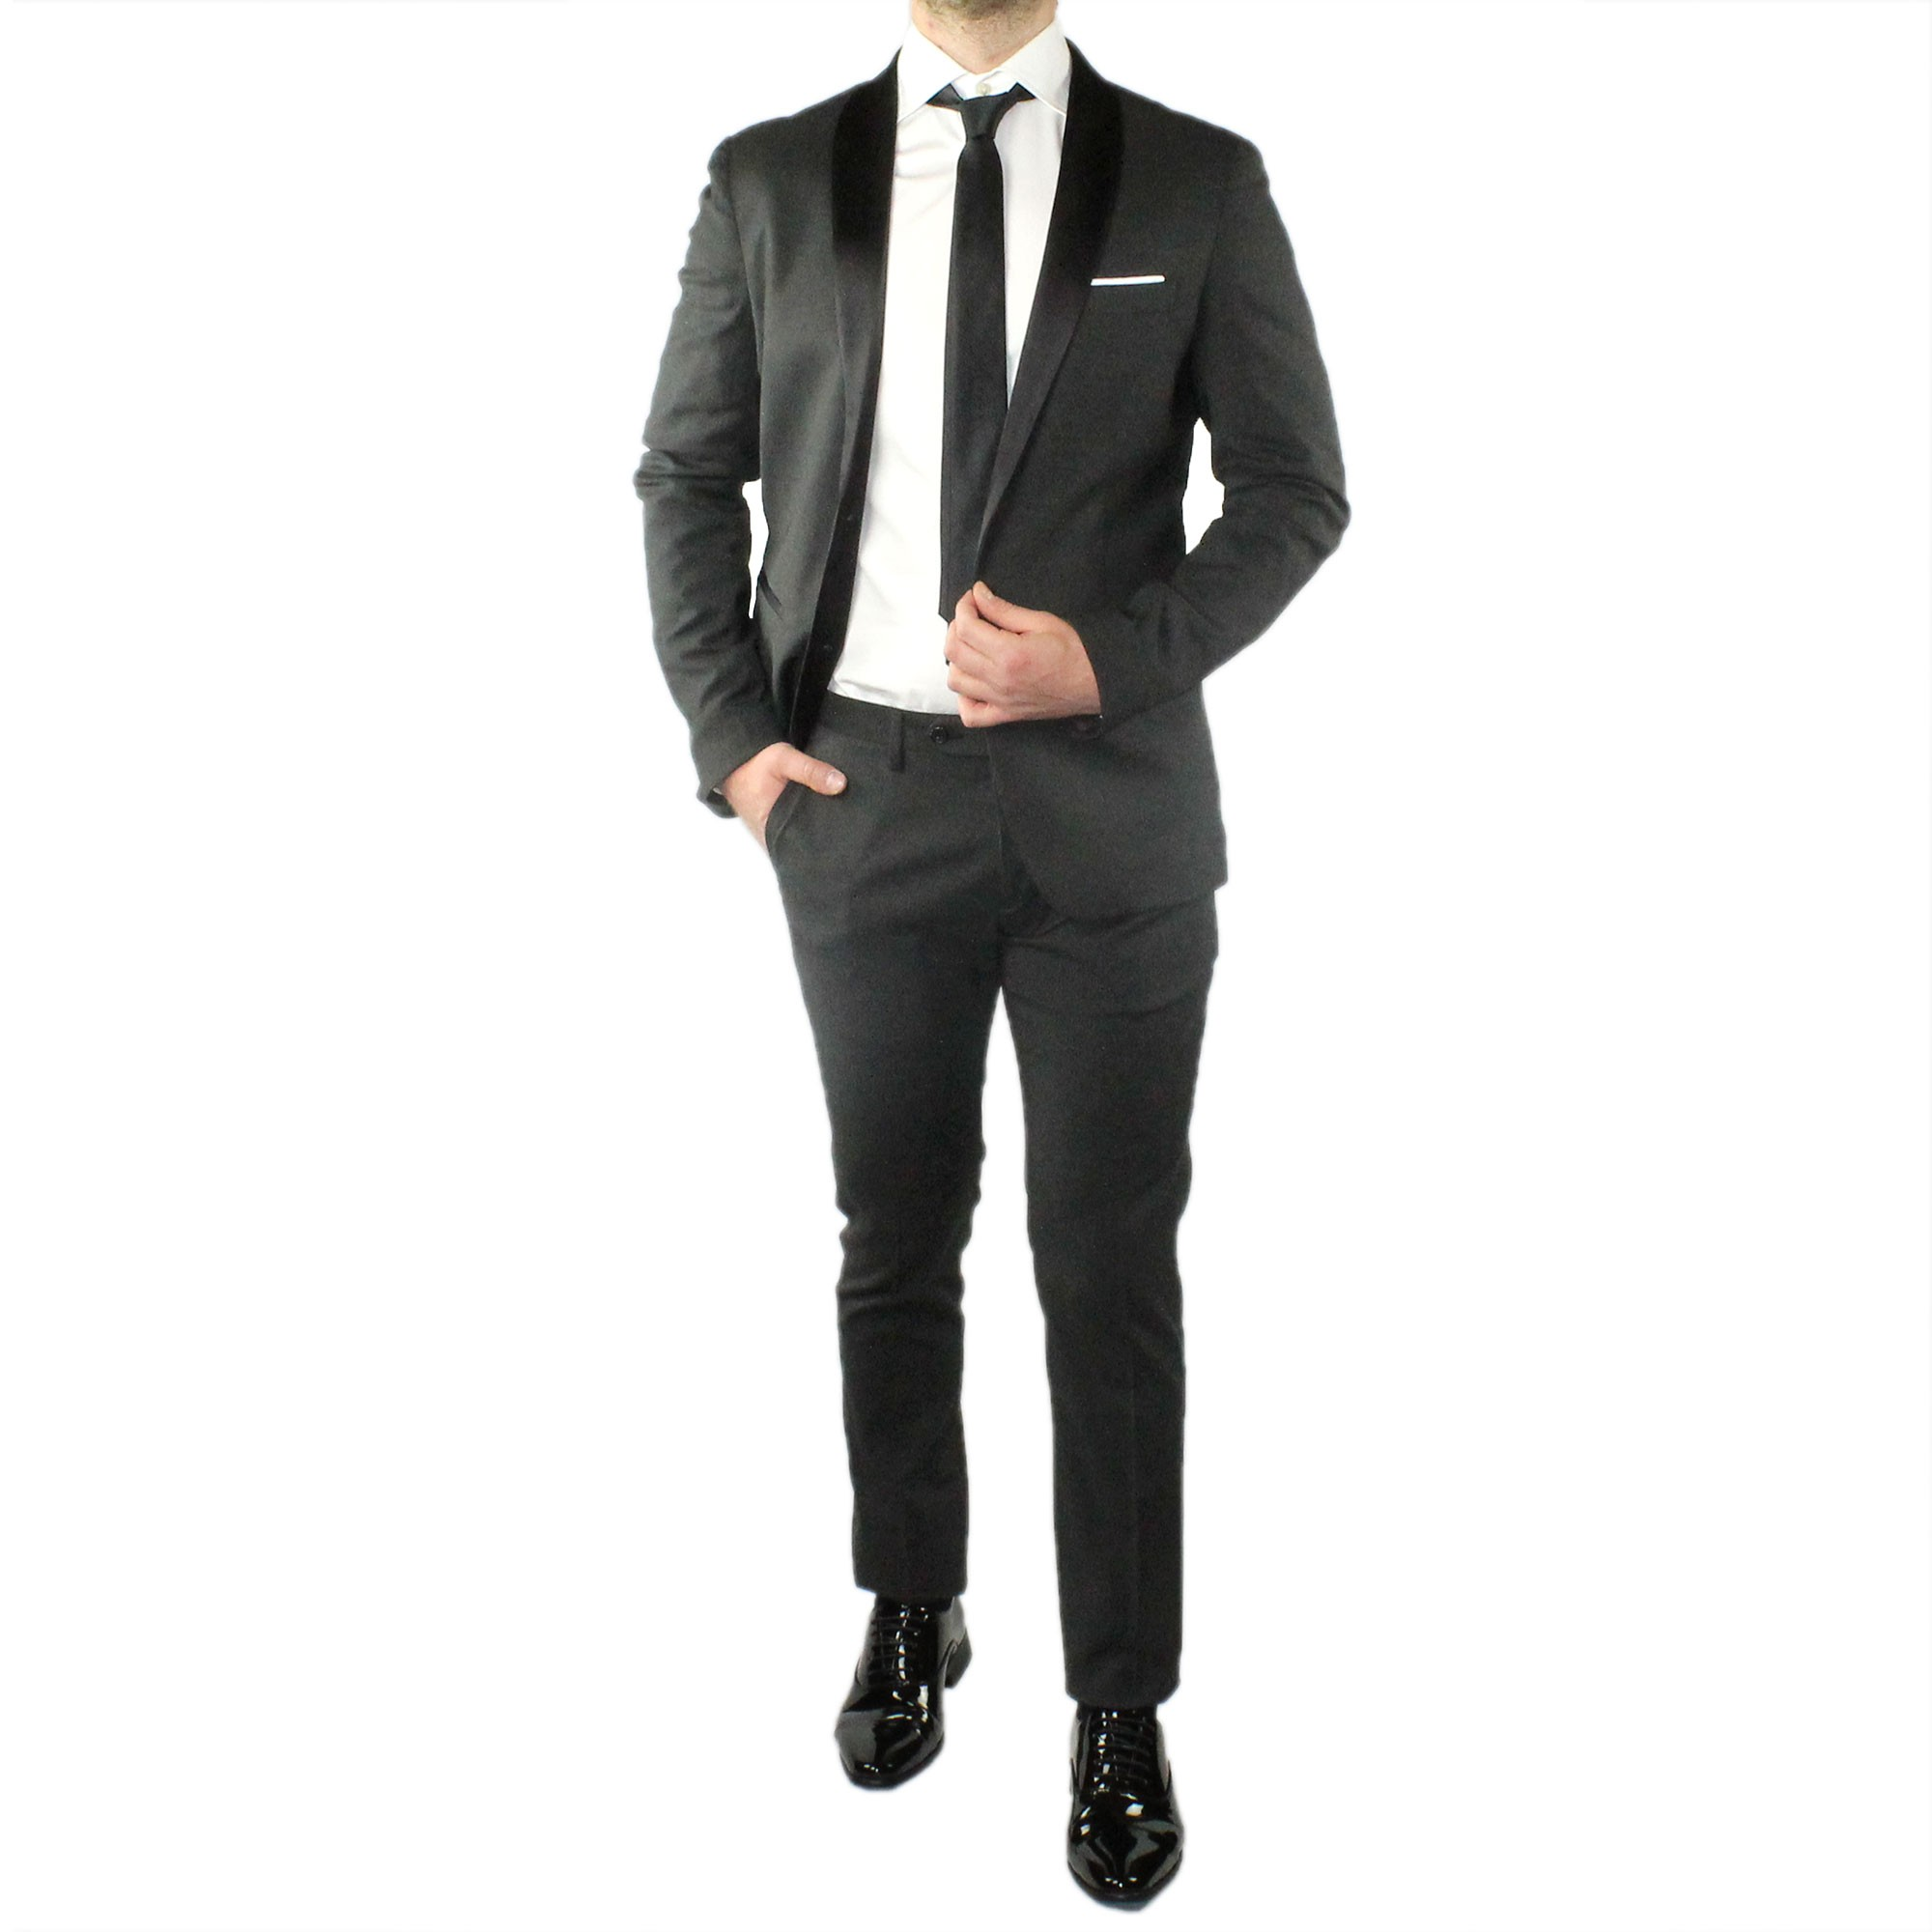 Abito-Uomo-Smoking-Elegante-Vestito-Completo-Estivo-Cerimonia-Sartoriale-Slim miniatura 9